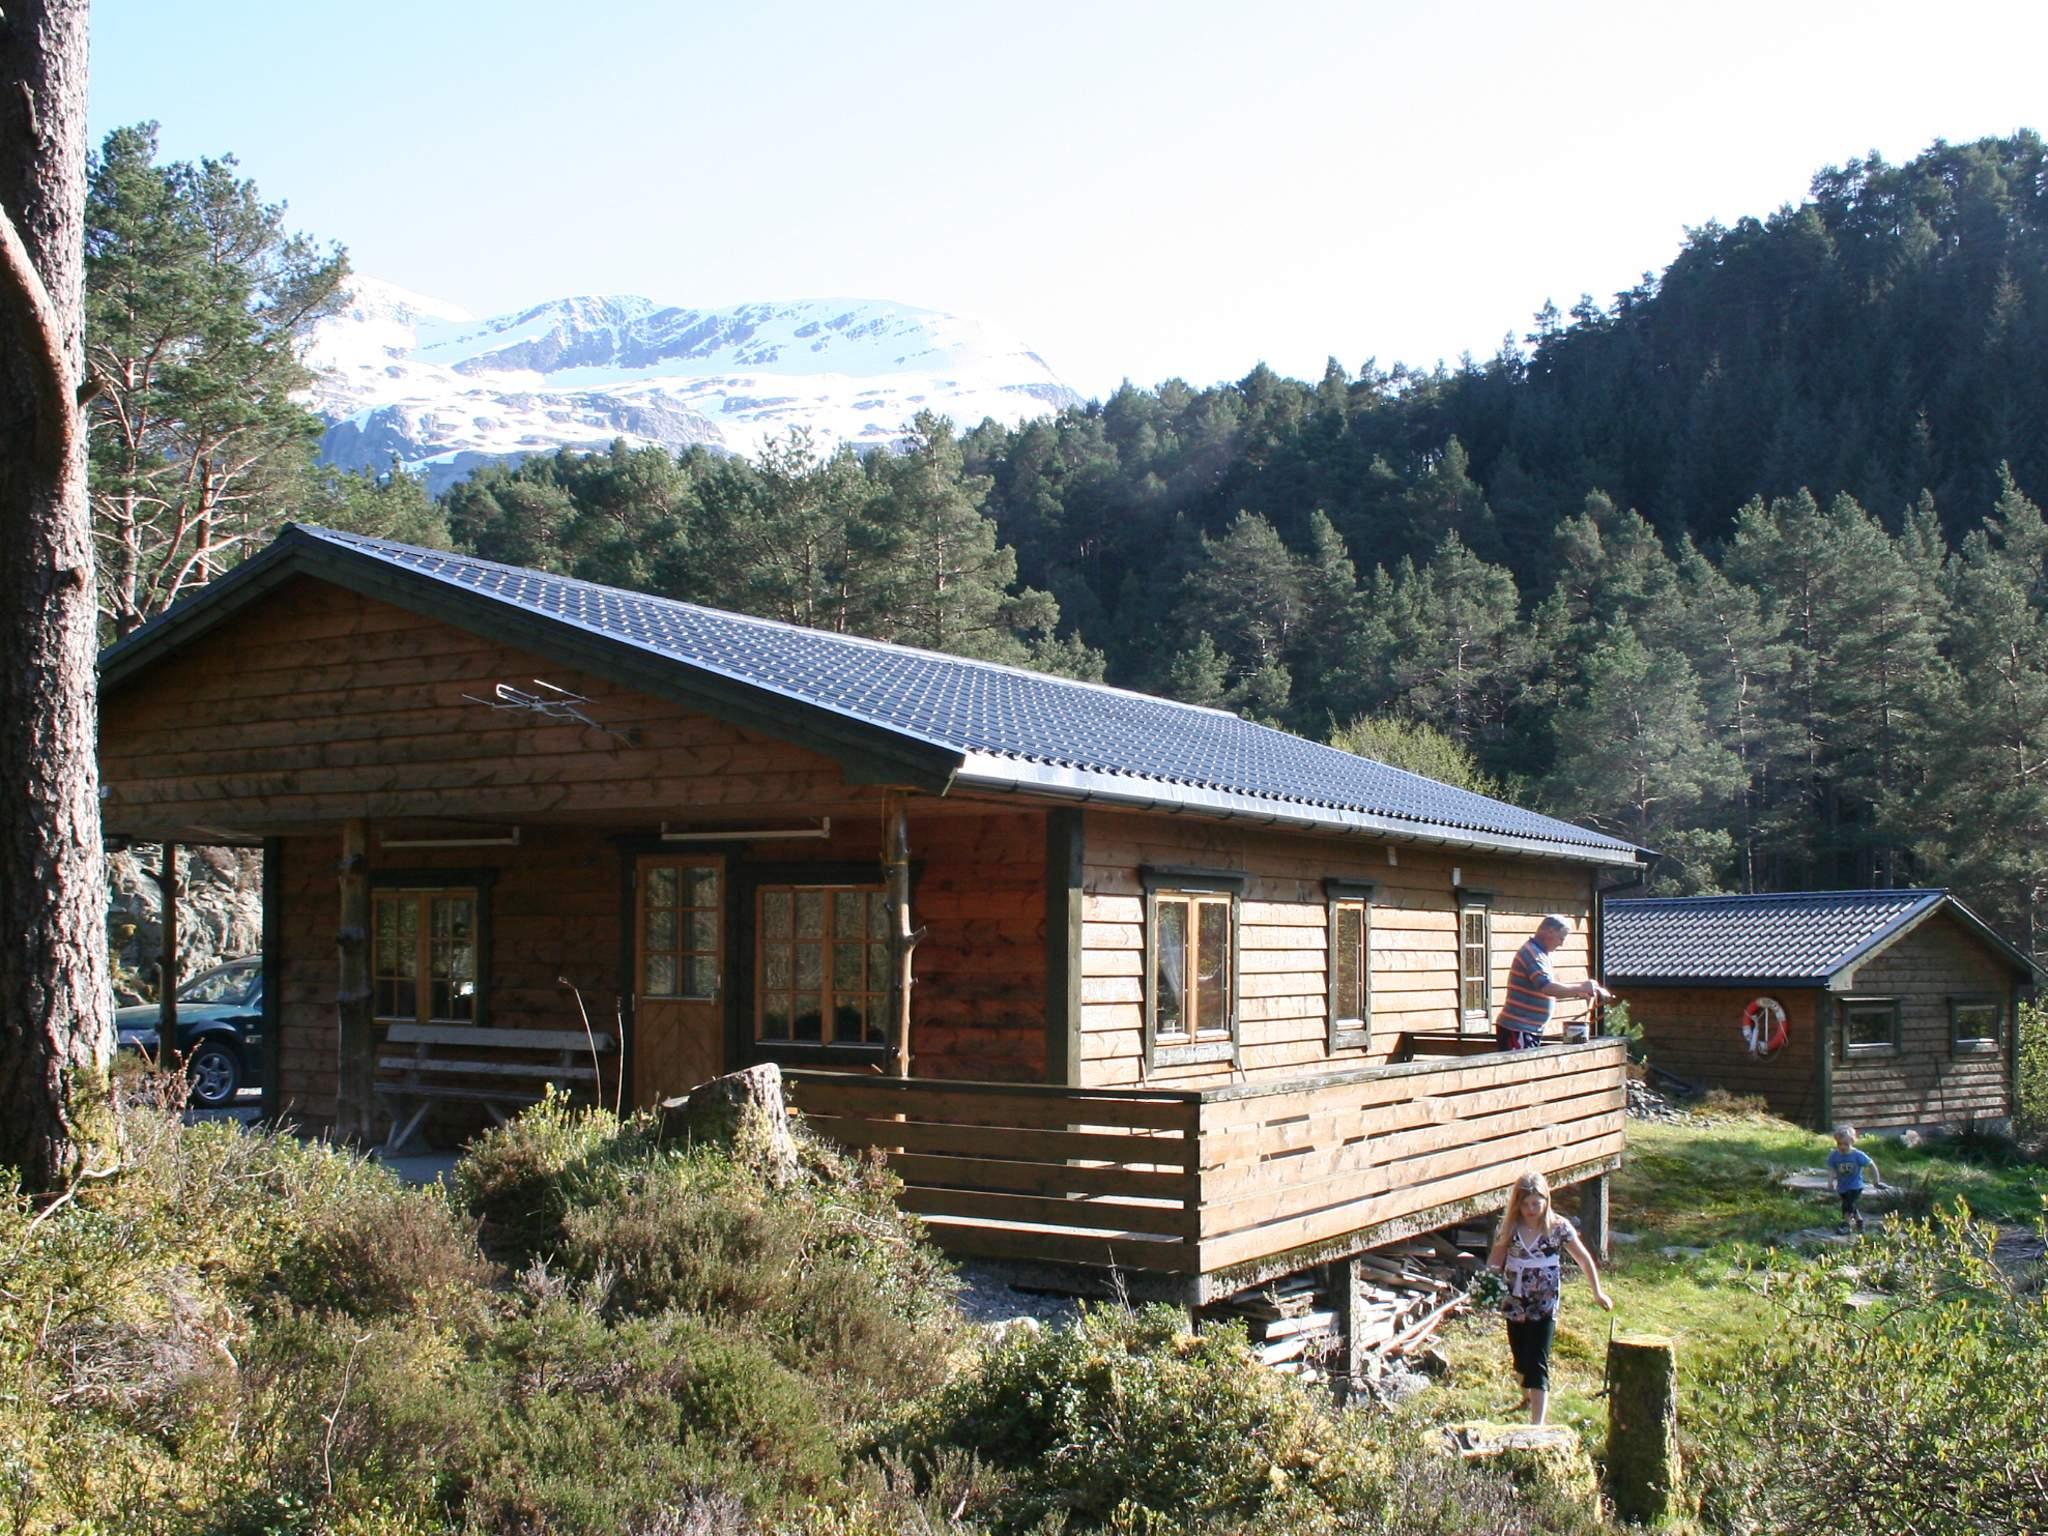 Ferienhaus Helle (82342), Naustdal, Sognefjord - Nordfjord, Westnorwegen, Norwegen, Bild 14